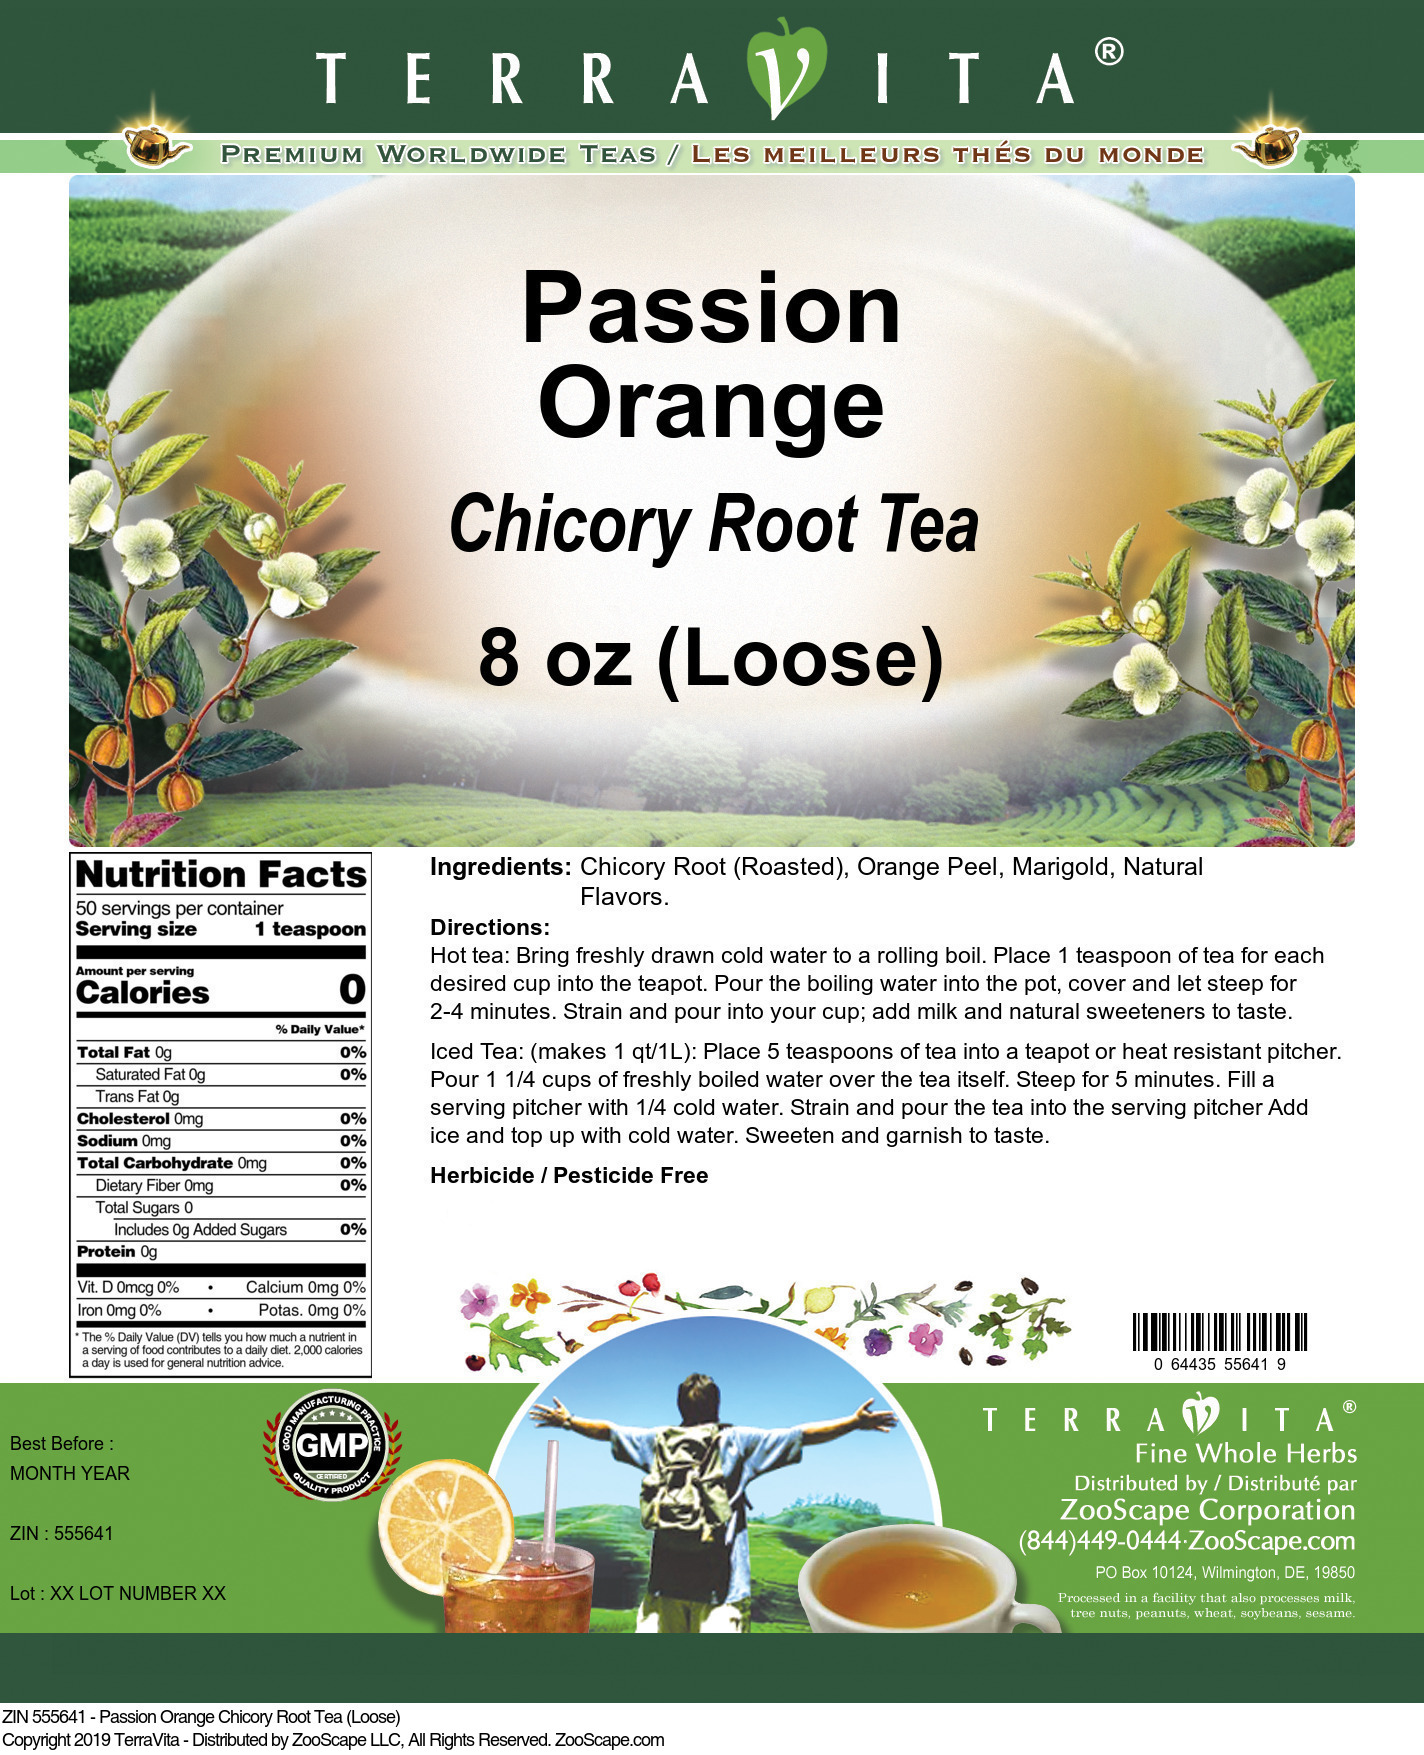 Passion Orange Chicory Root Tea (Loose)